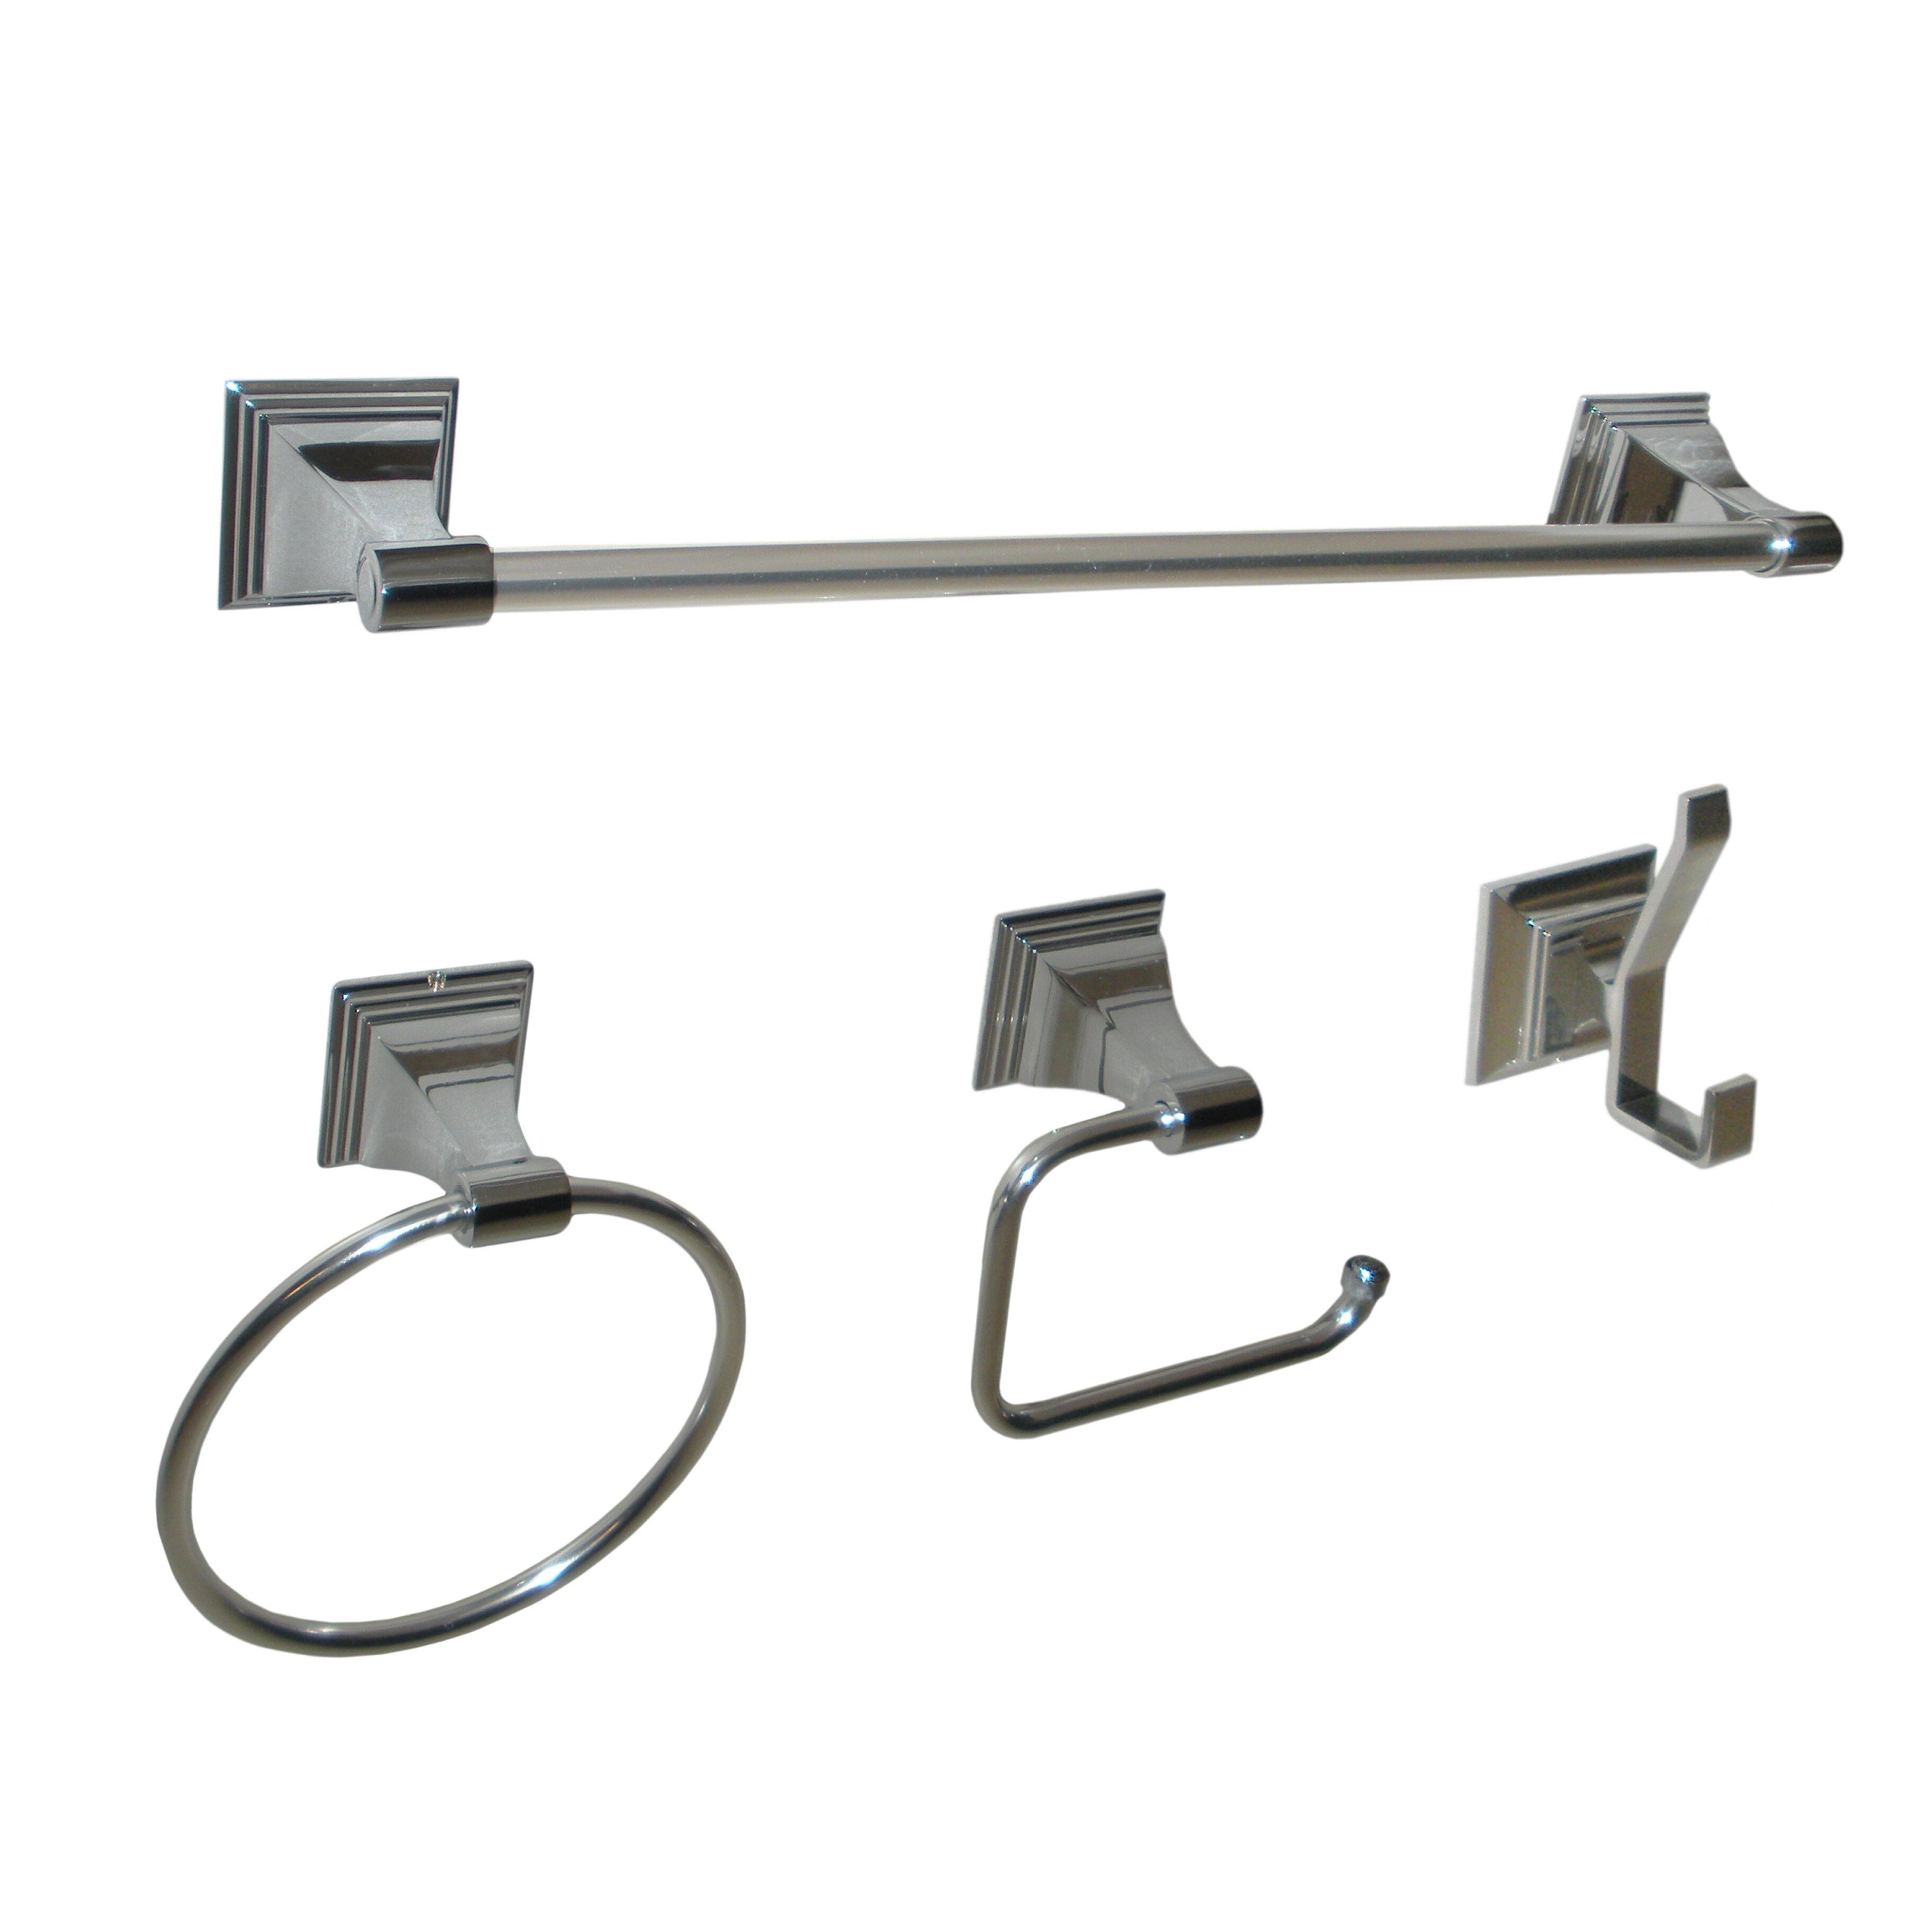 leonard 4 piece wall mounted bathroom hardware set reviews wayfair